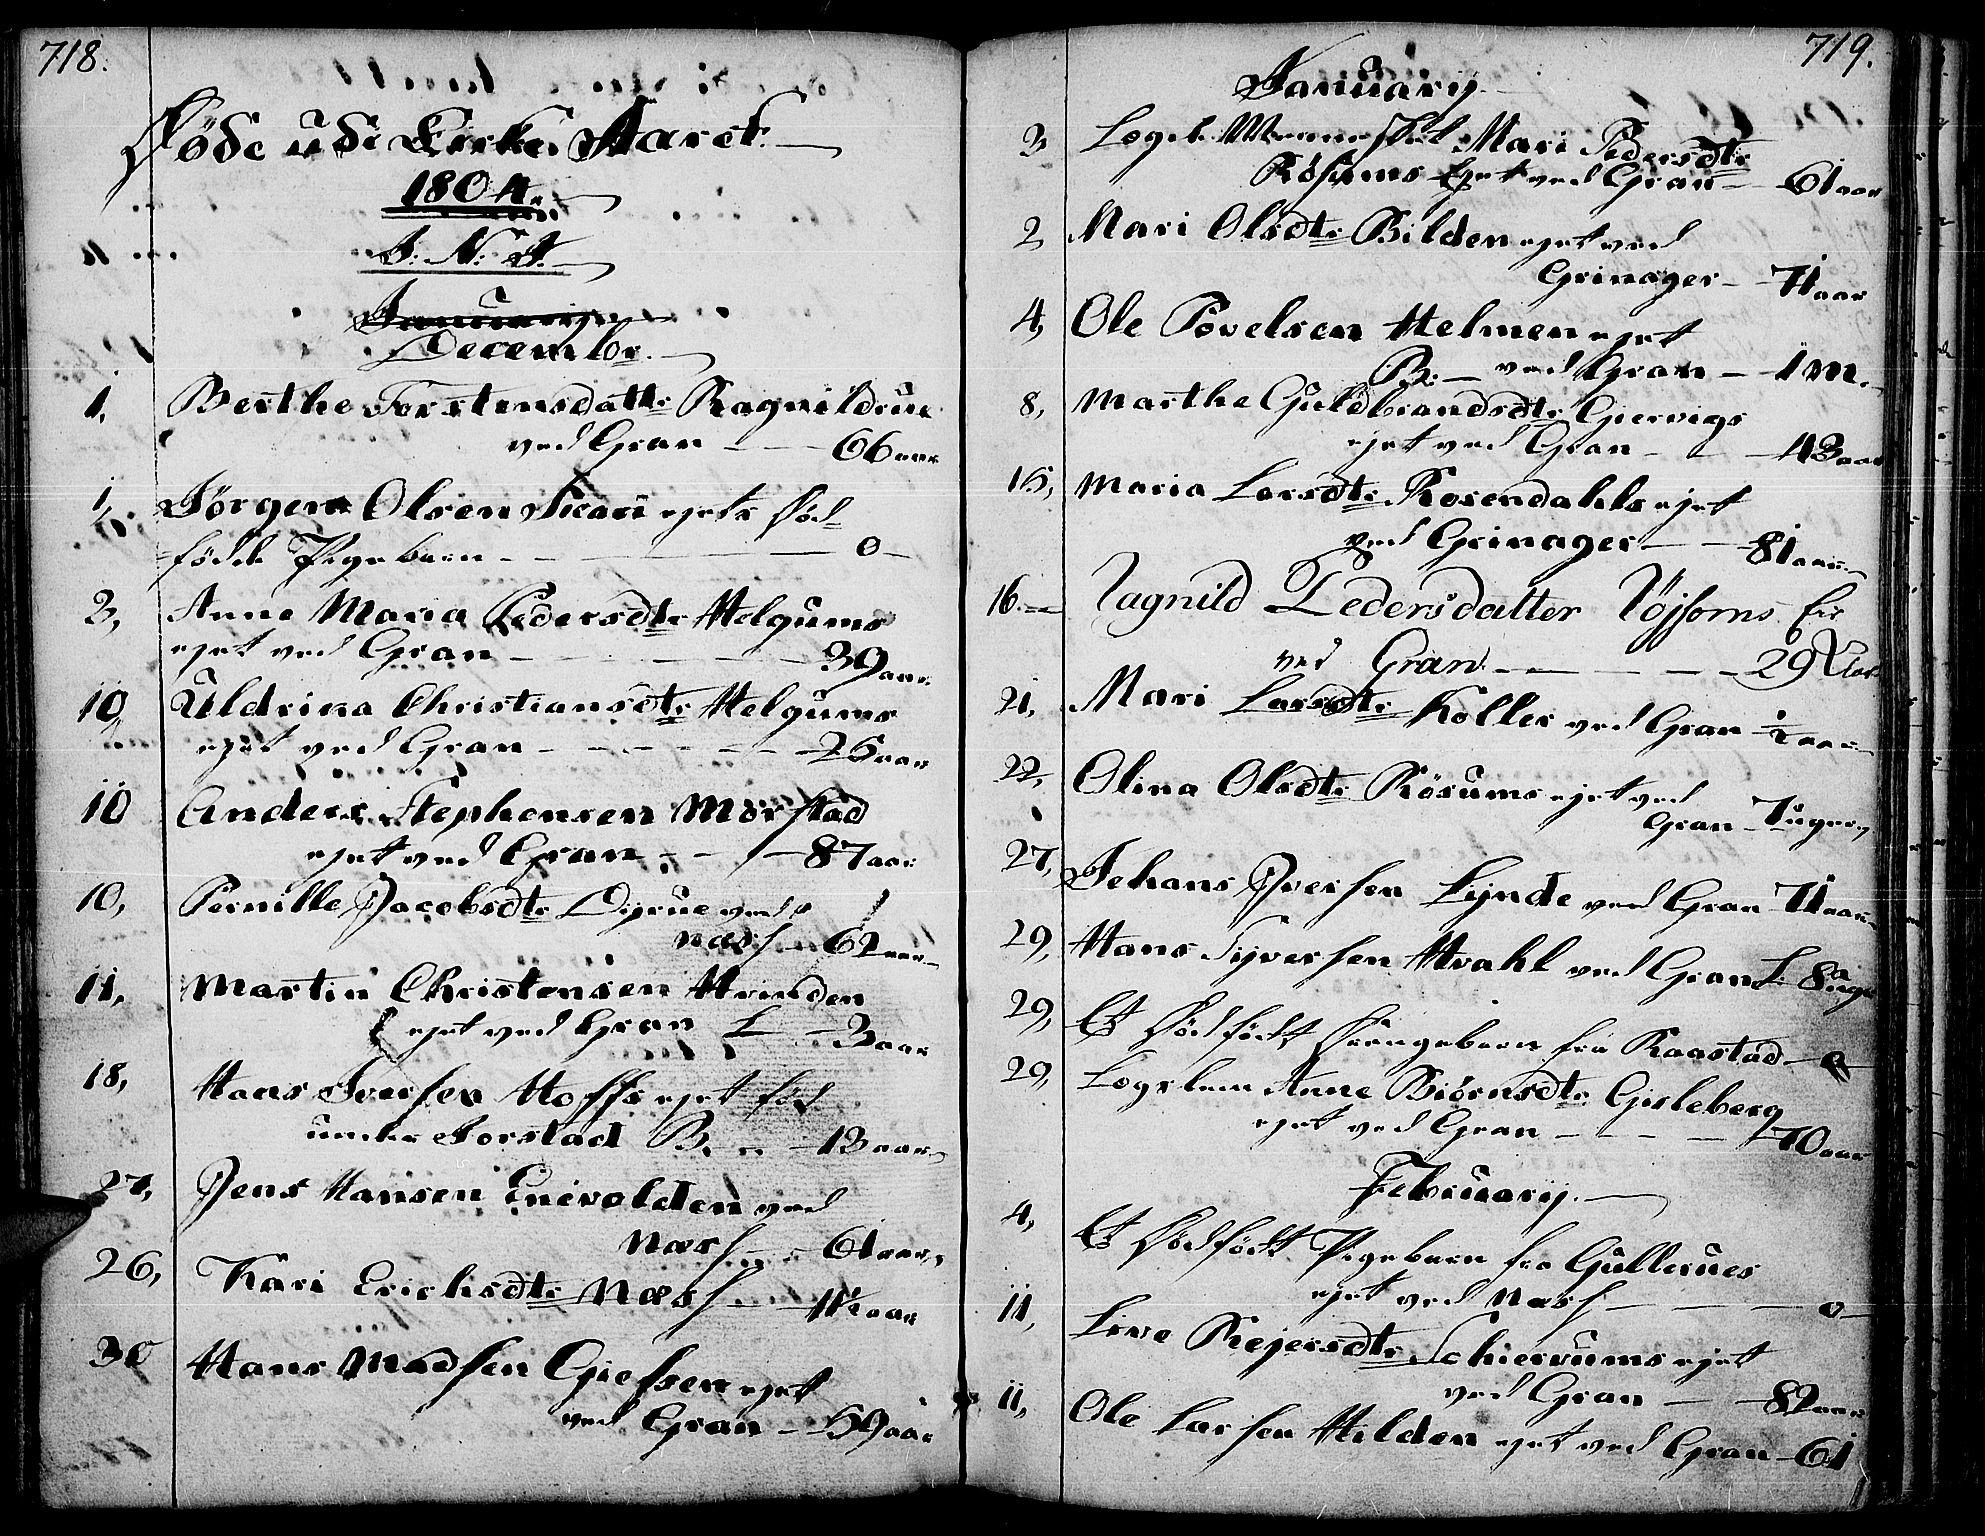 SAH, Gran prestekontor, Ministerialbok nr. 6, 1787-1824, s. 718-719